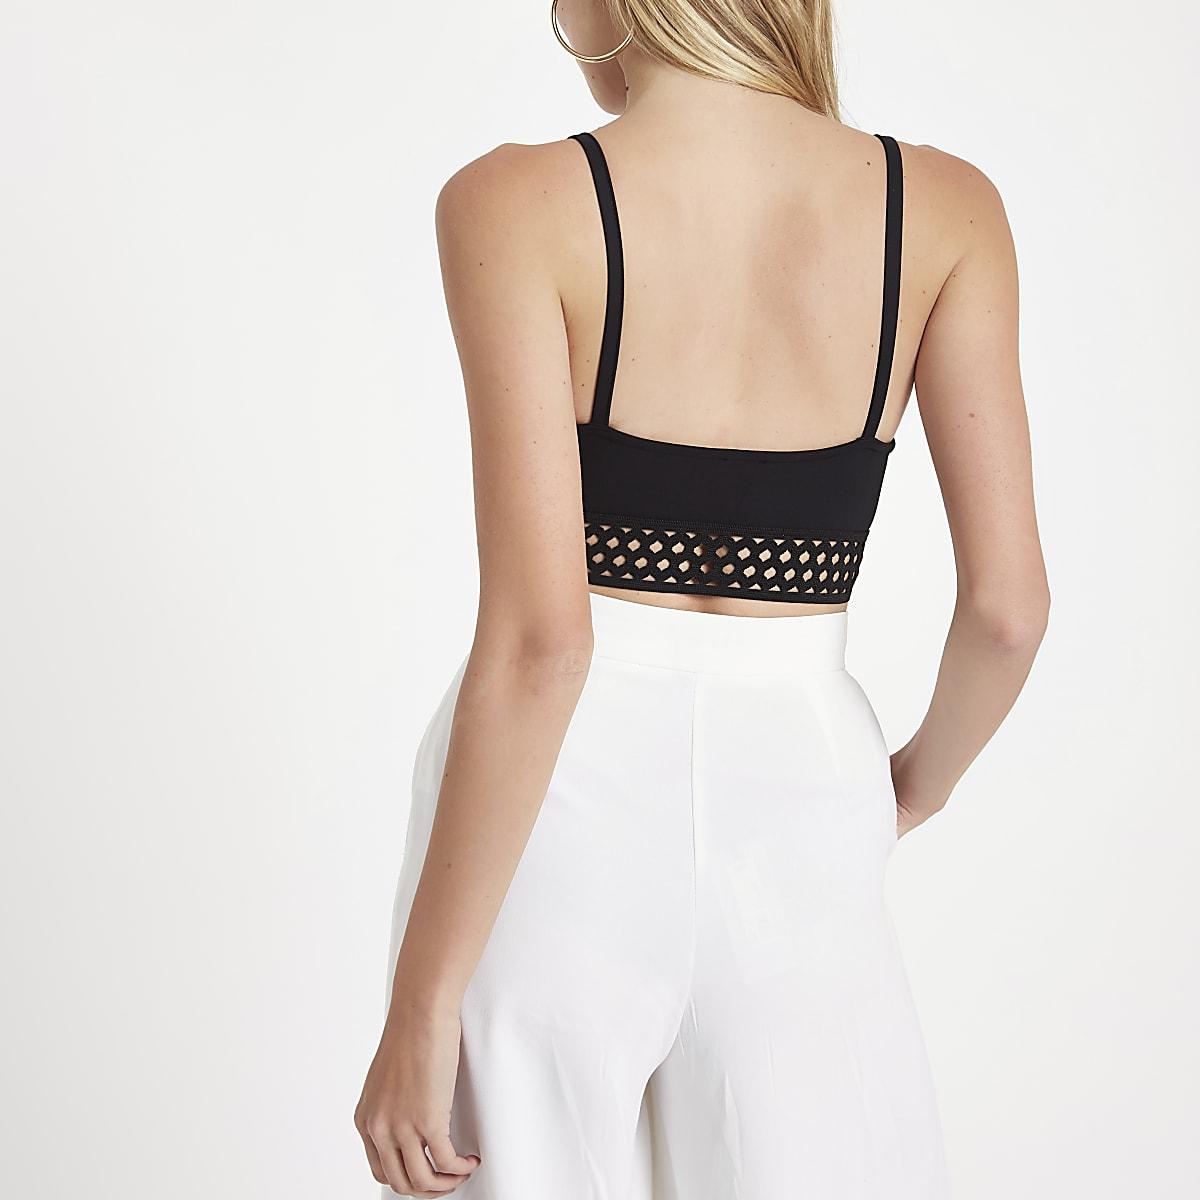 ac541445385a2a Black lace applique mesh band bralet - Crop Tops   Bralets - Tops ...